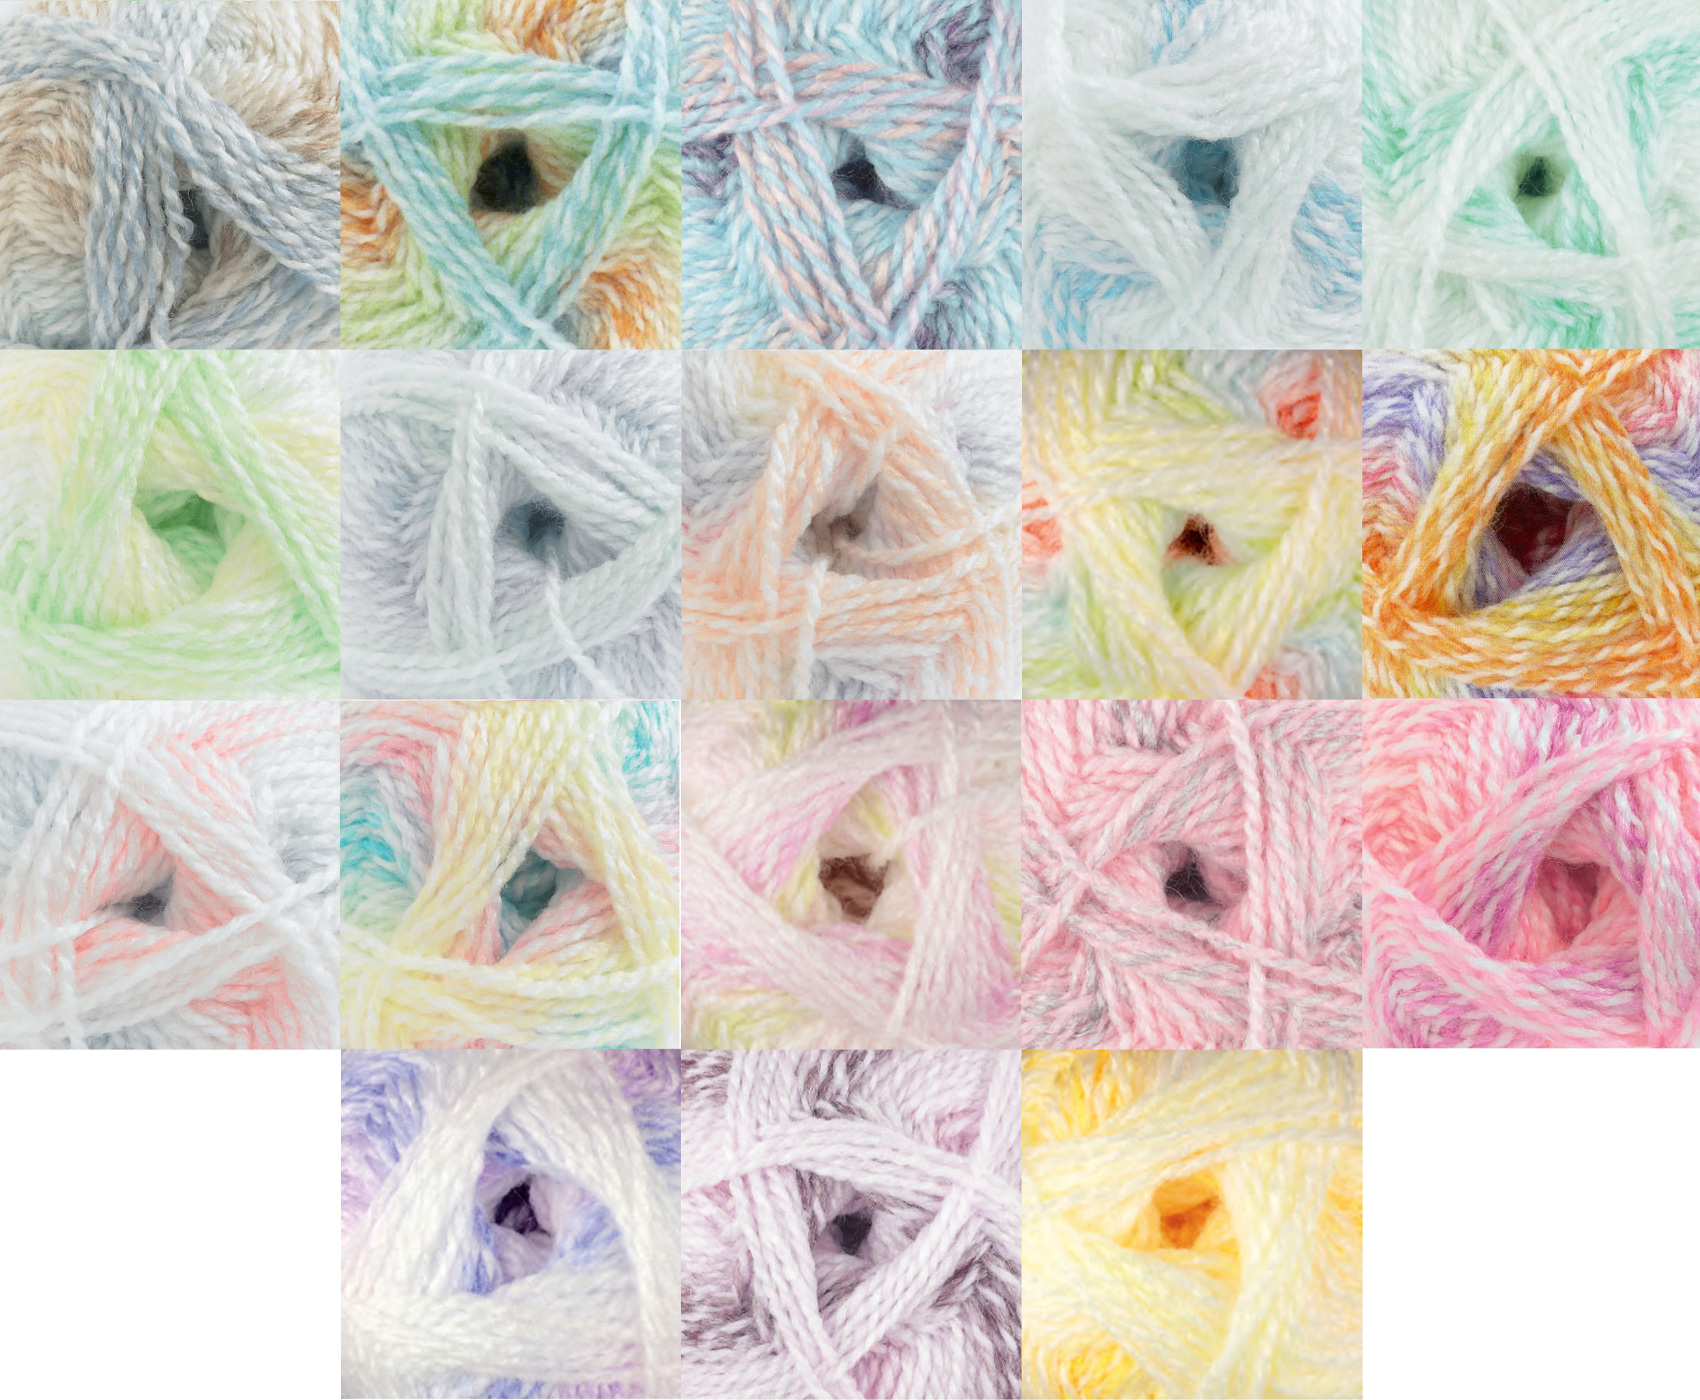 Baby Marble Double Knit DK Yarn James Brett Soft Acrylic Knitting Wool 100g Ball